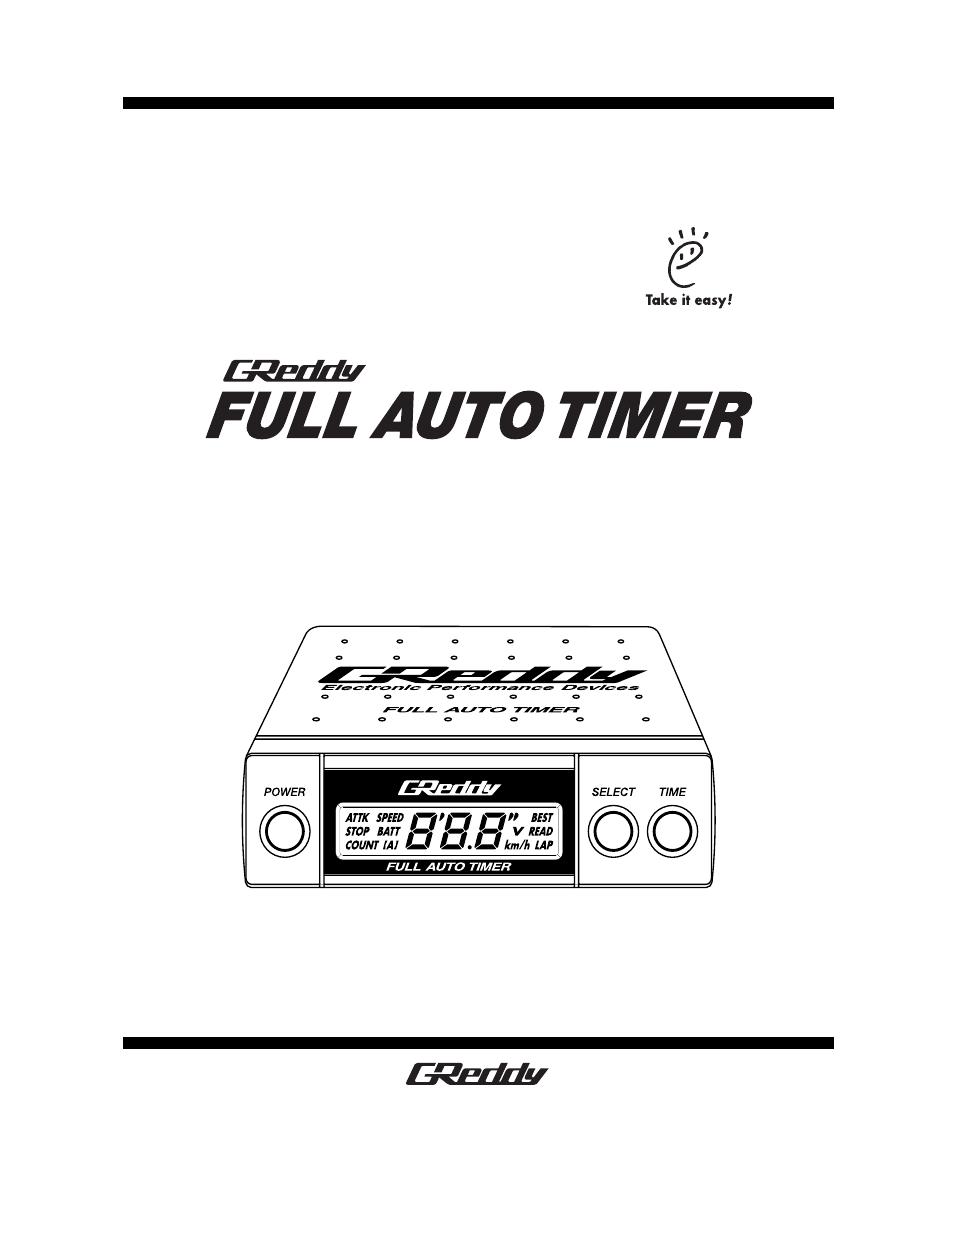 turbo timer manual